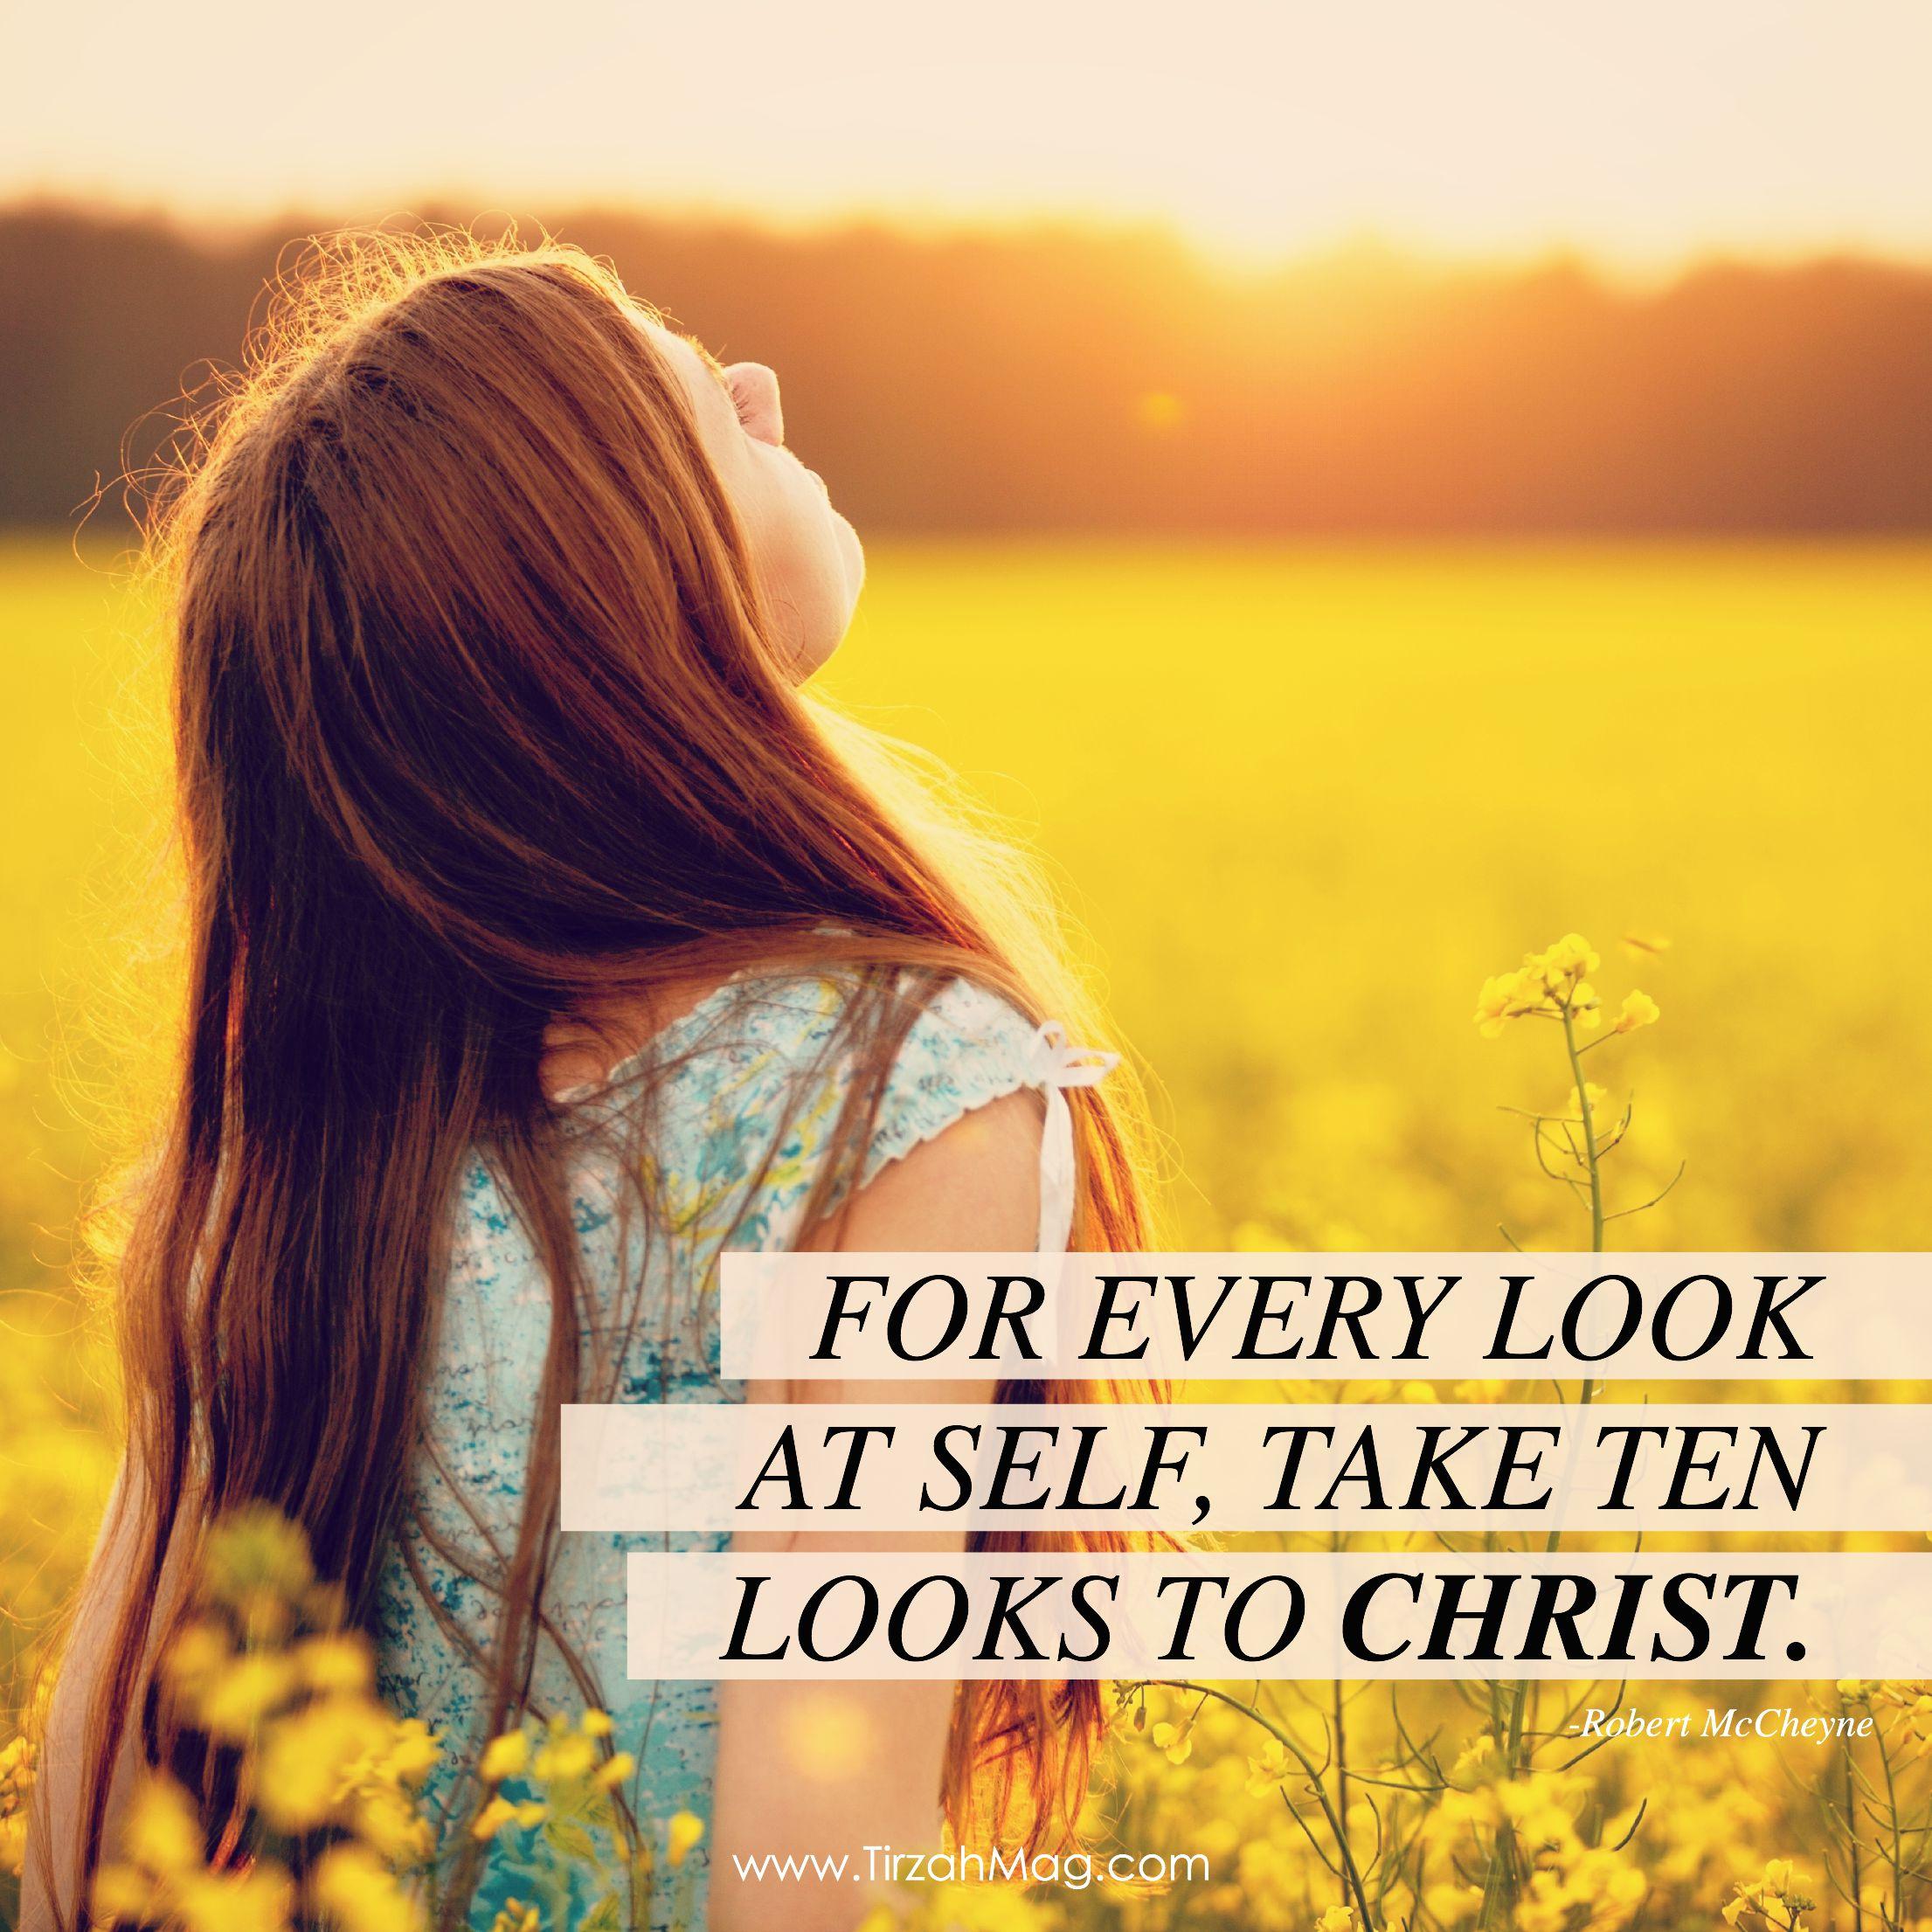 Take ten looks to Christ